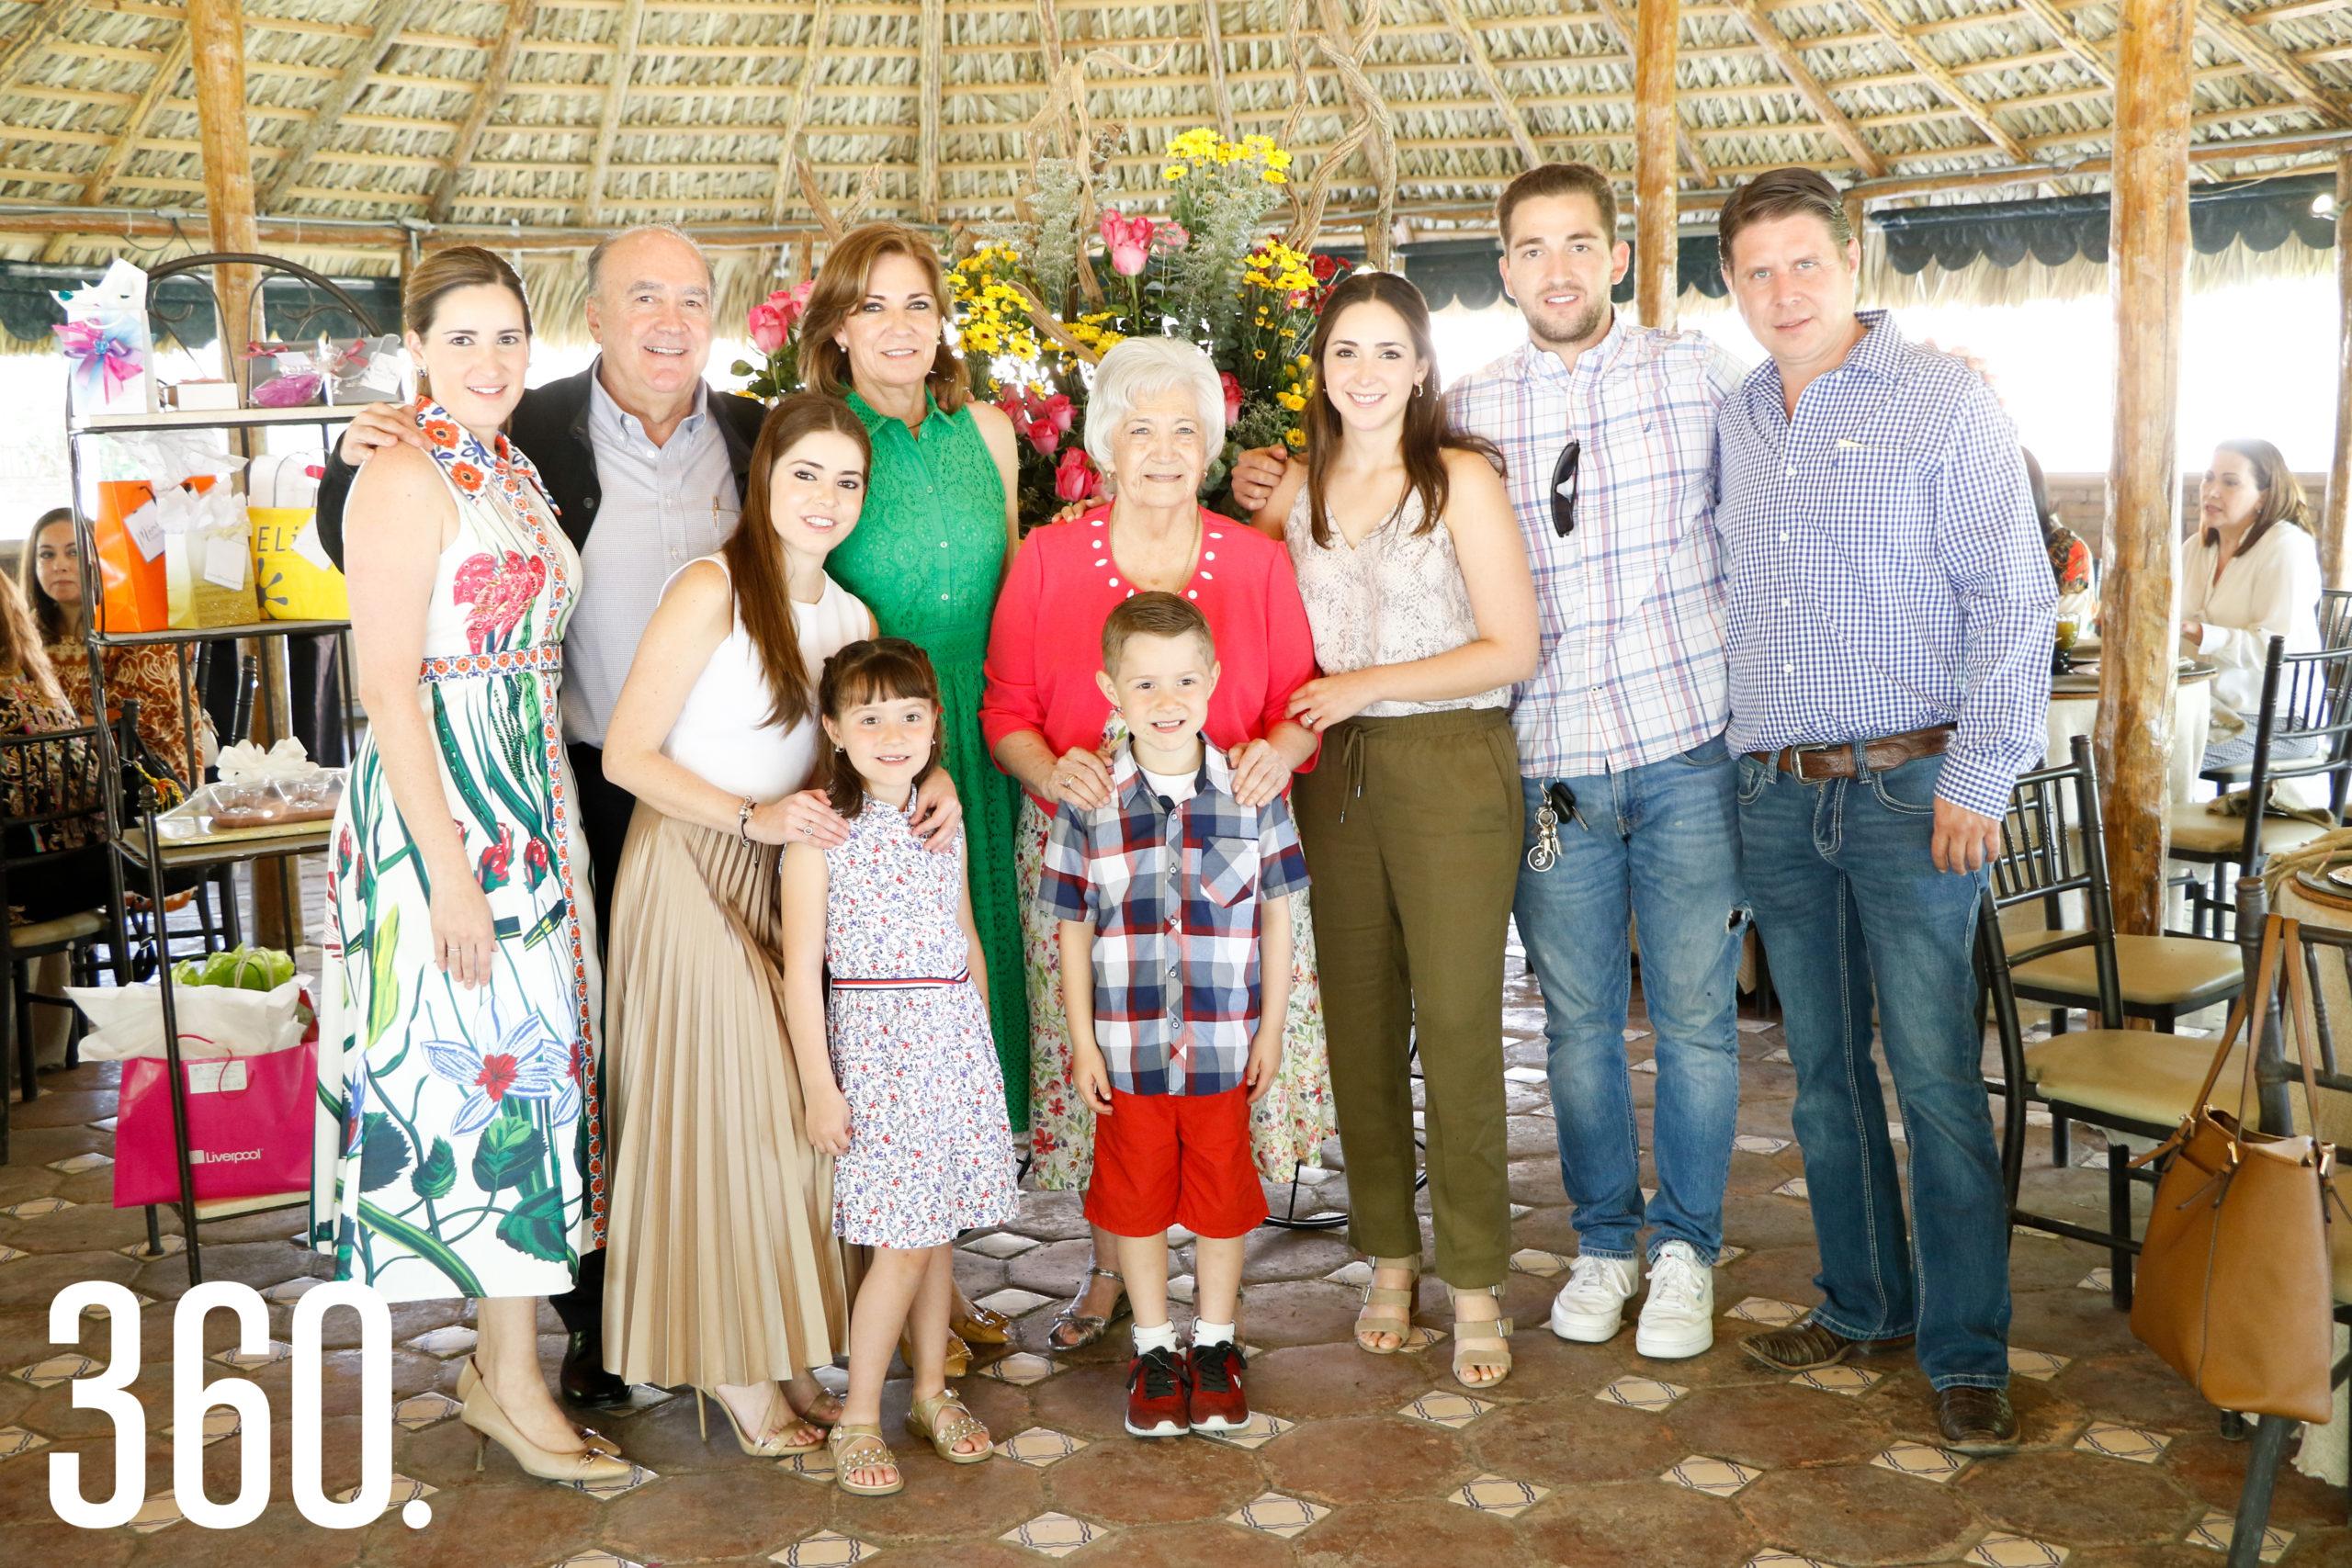 Gloria con su familia, Gloria Dávila, Jorge Dávila, María Inés Dávila, Jimena Morelos, Rodrigo Morelos, Toñeta Flores, Valeria Dávila, Jorge Dávila y Rodrigo Morelos.